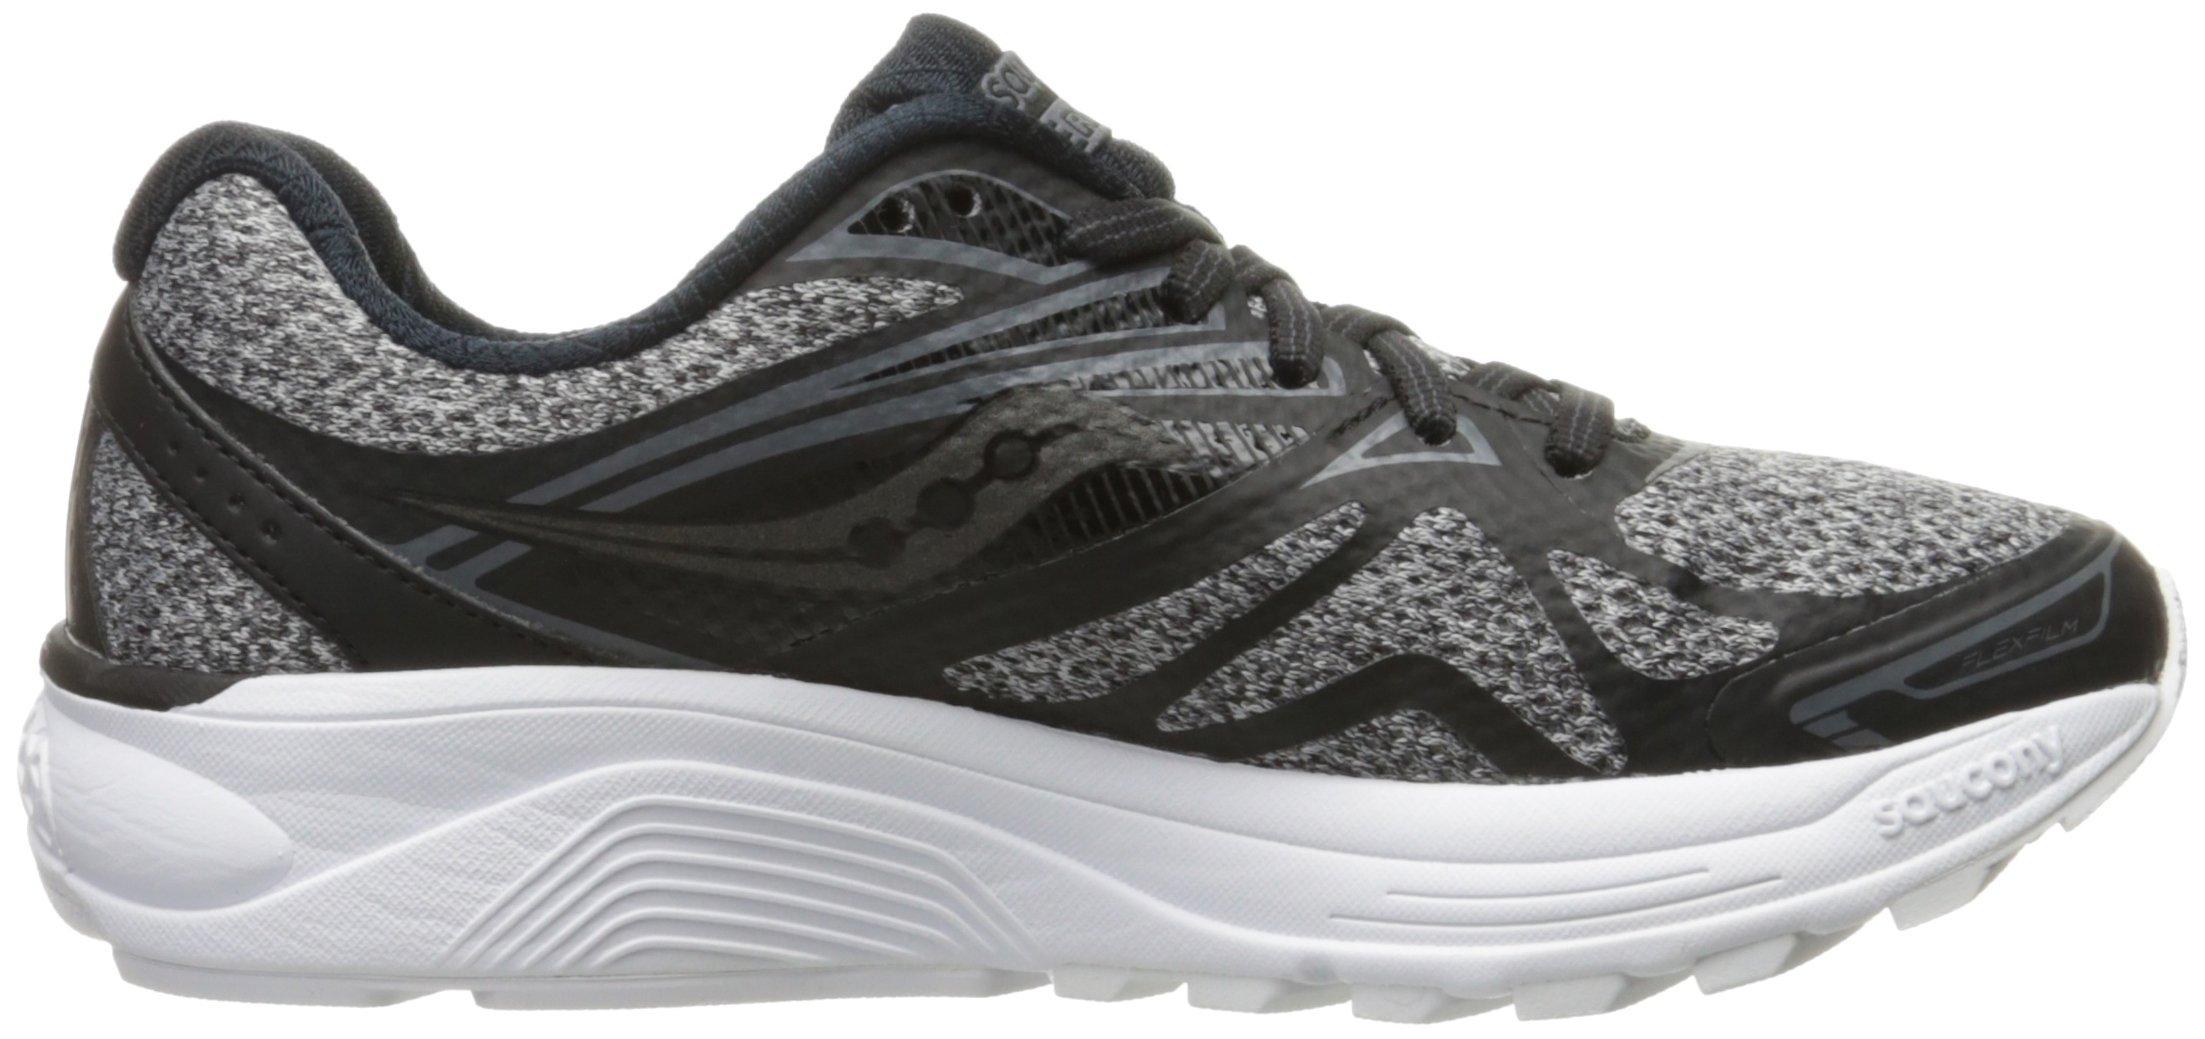 717WcHbDUFL - Saucony Women's Ride 9 Lr Running Shoe, Grey/Black, 5 M US